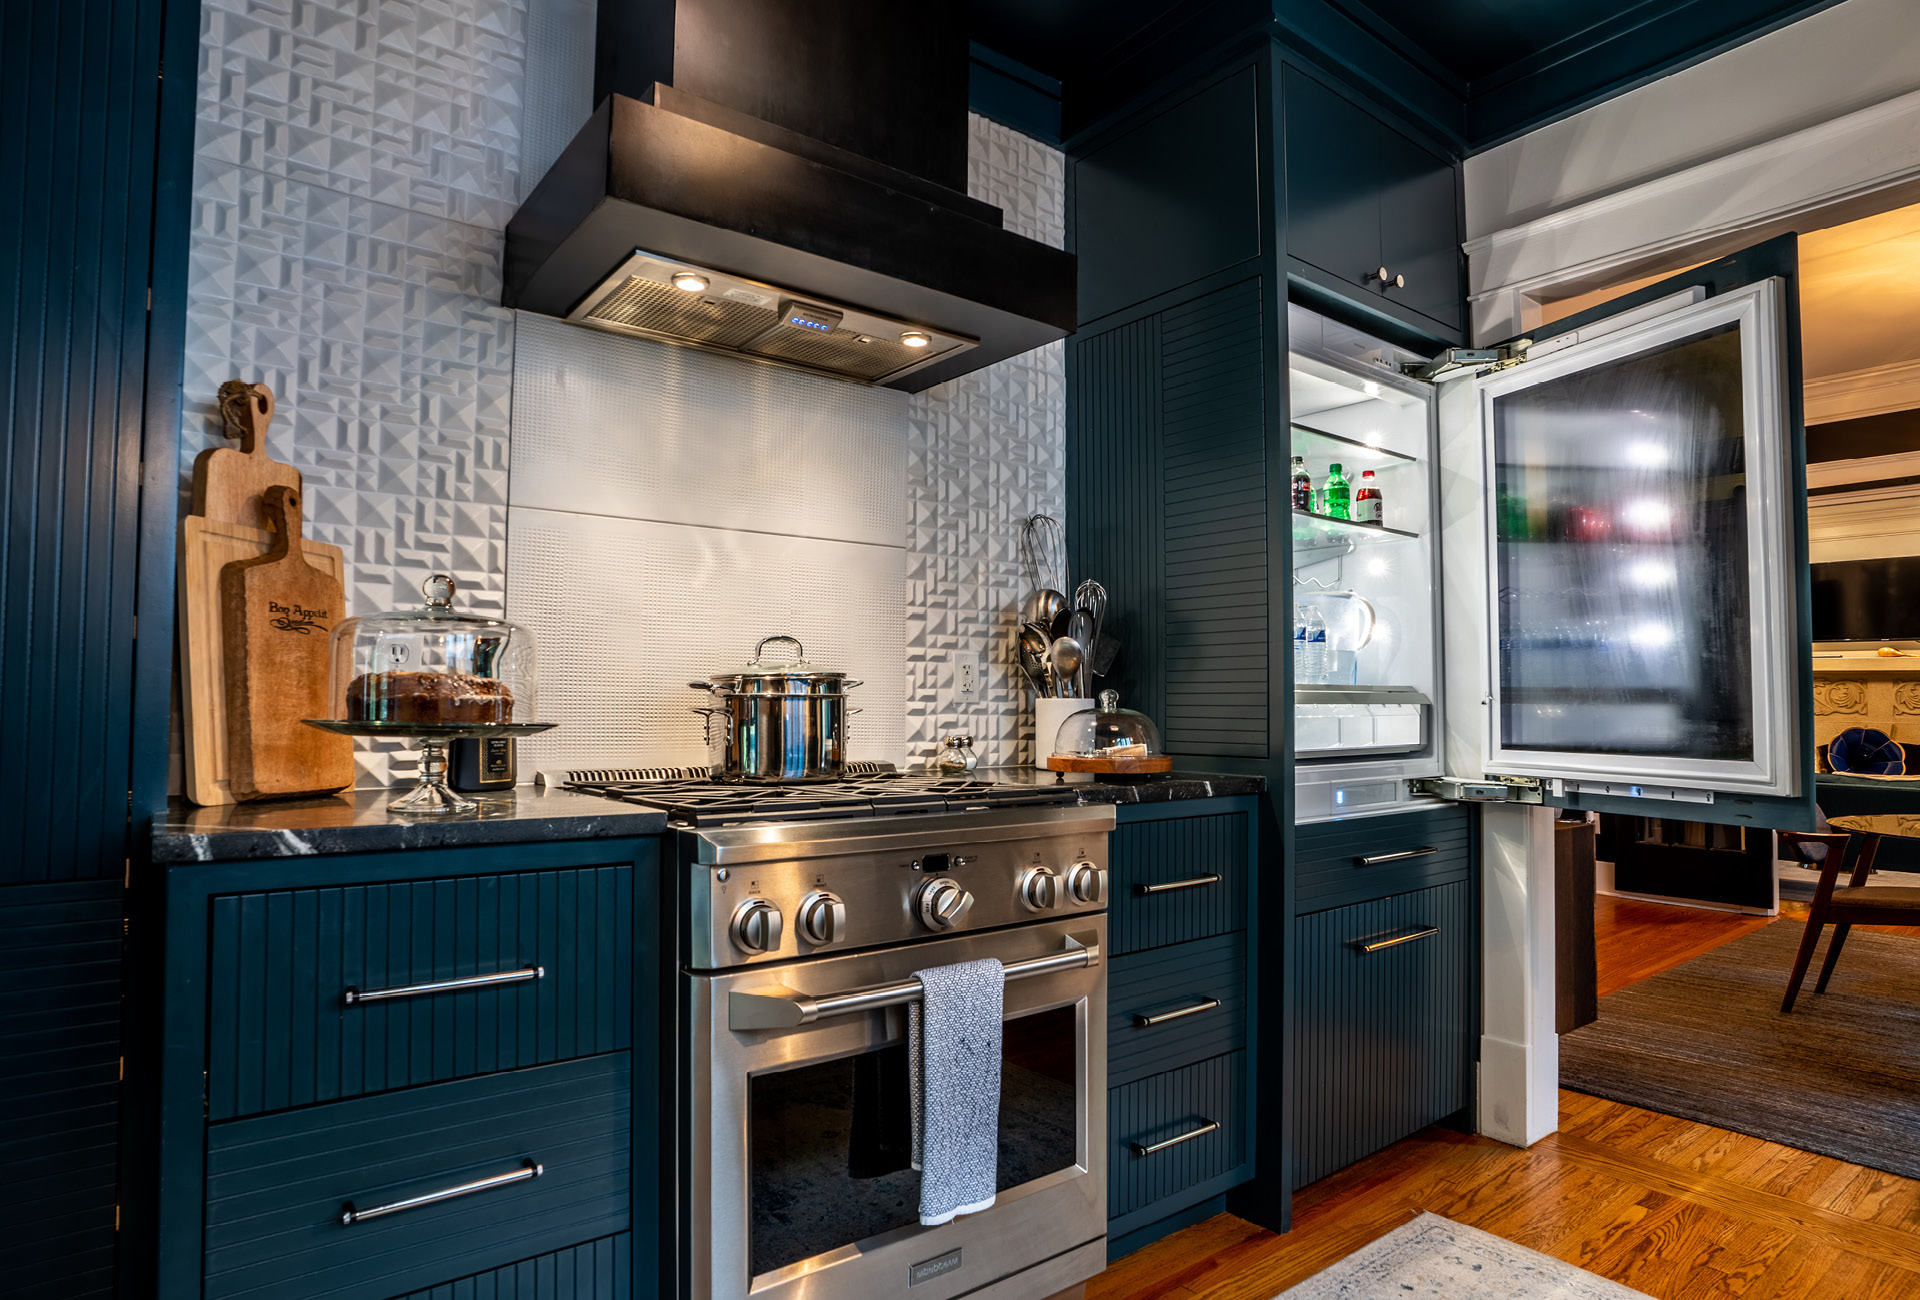 The NashVilla's spacious and modern kitchen